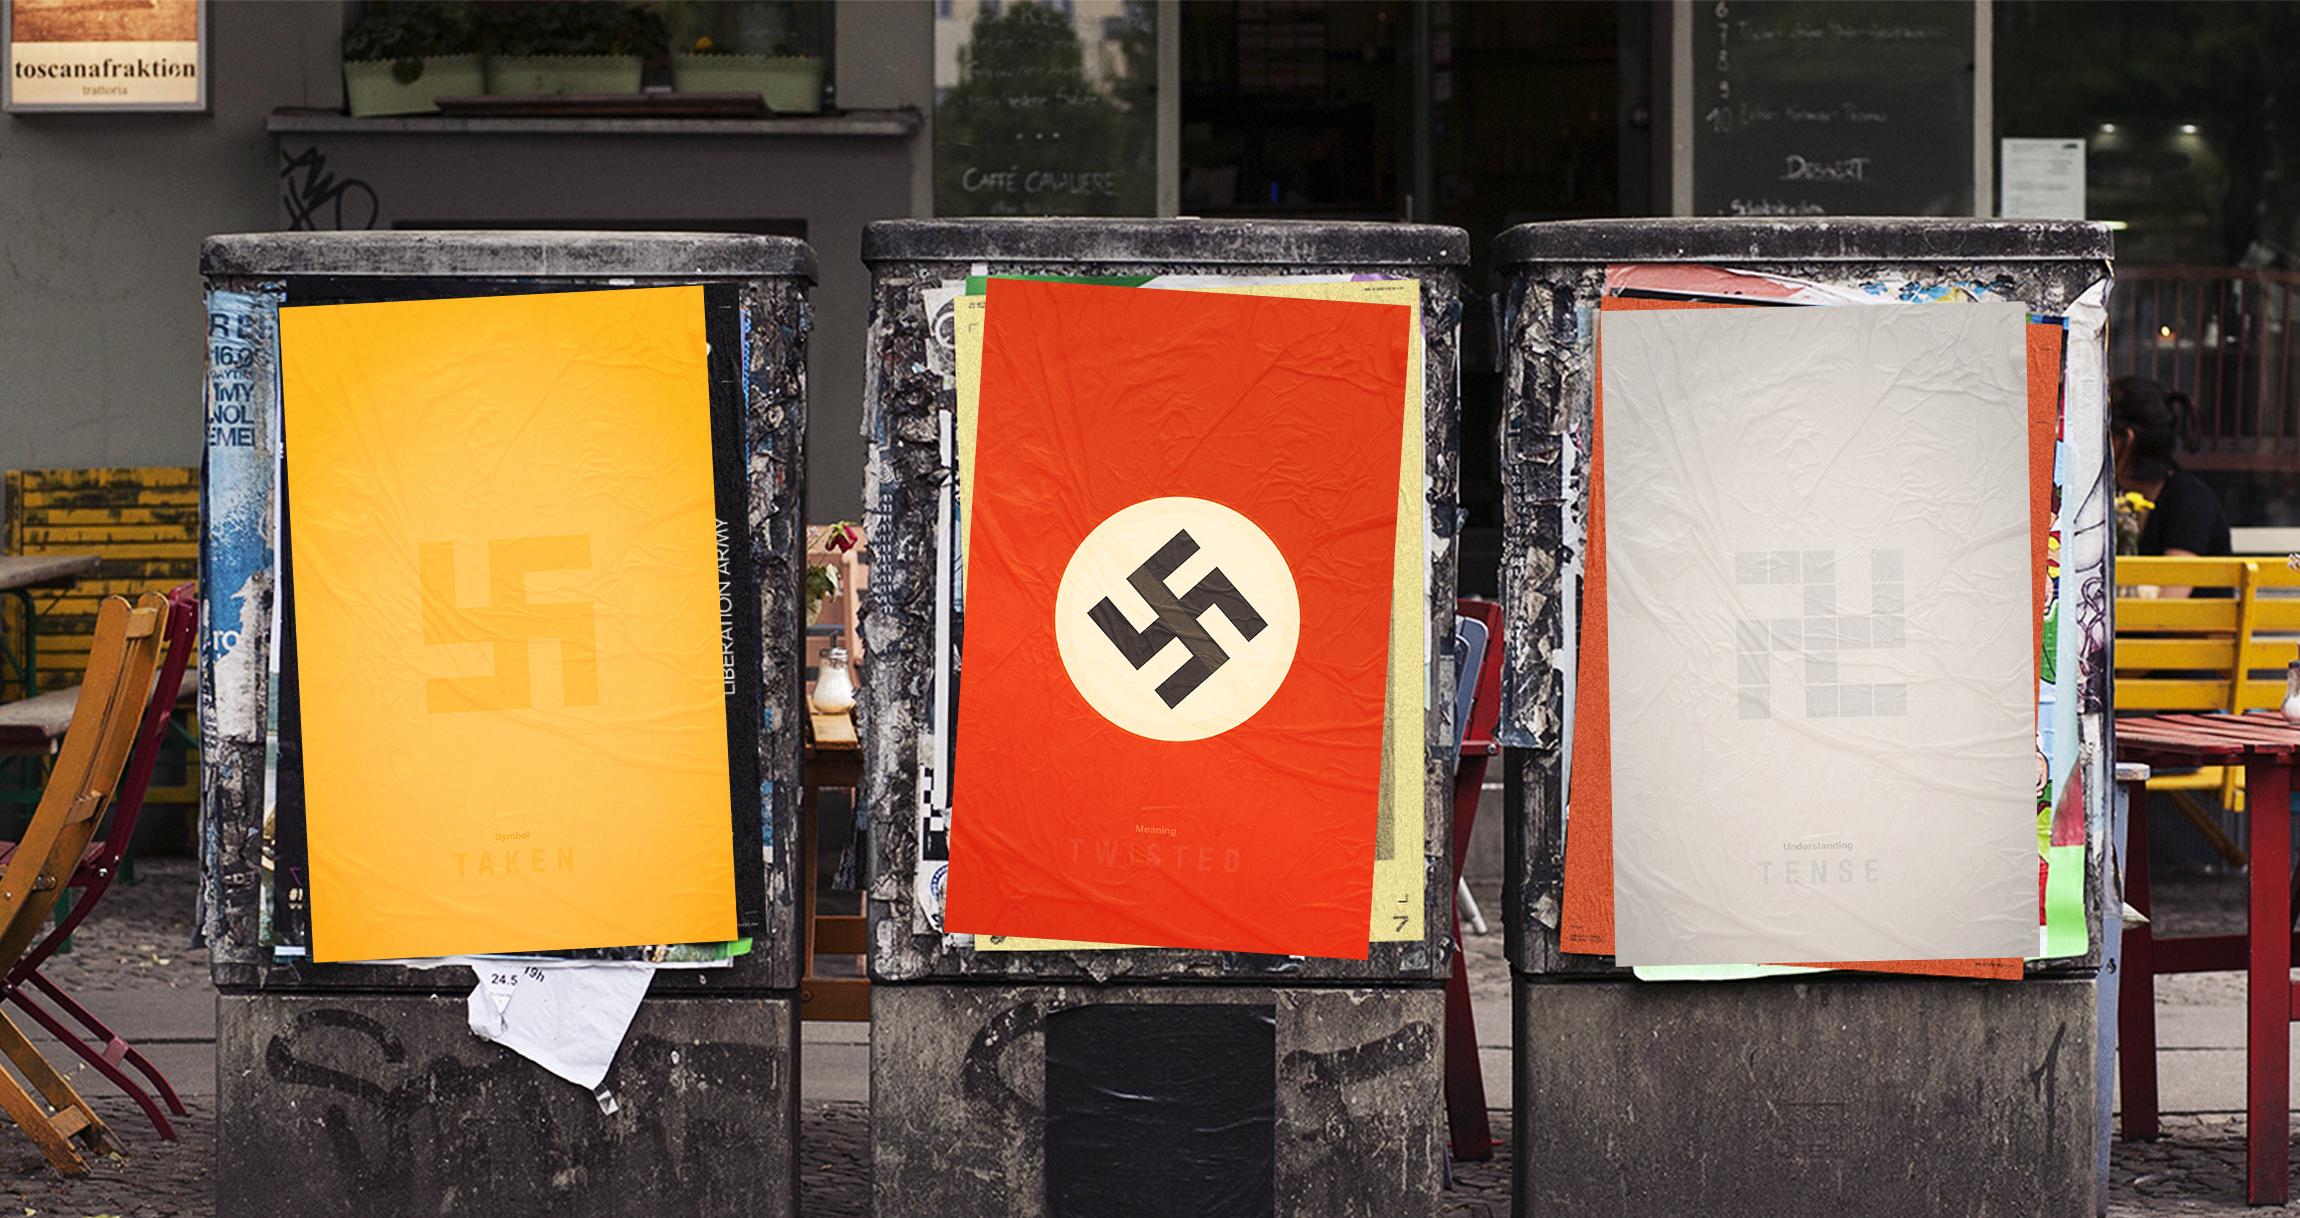 symbolism-poster-series-application-image-1